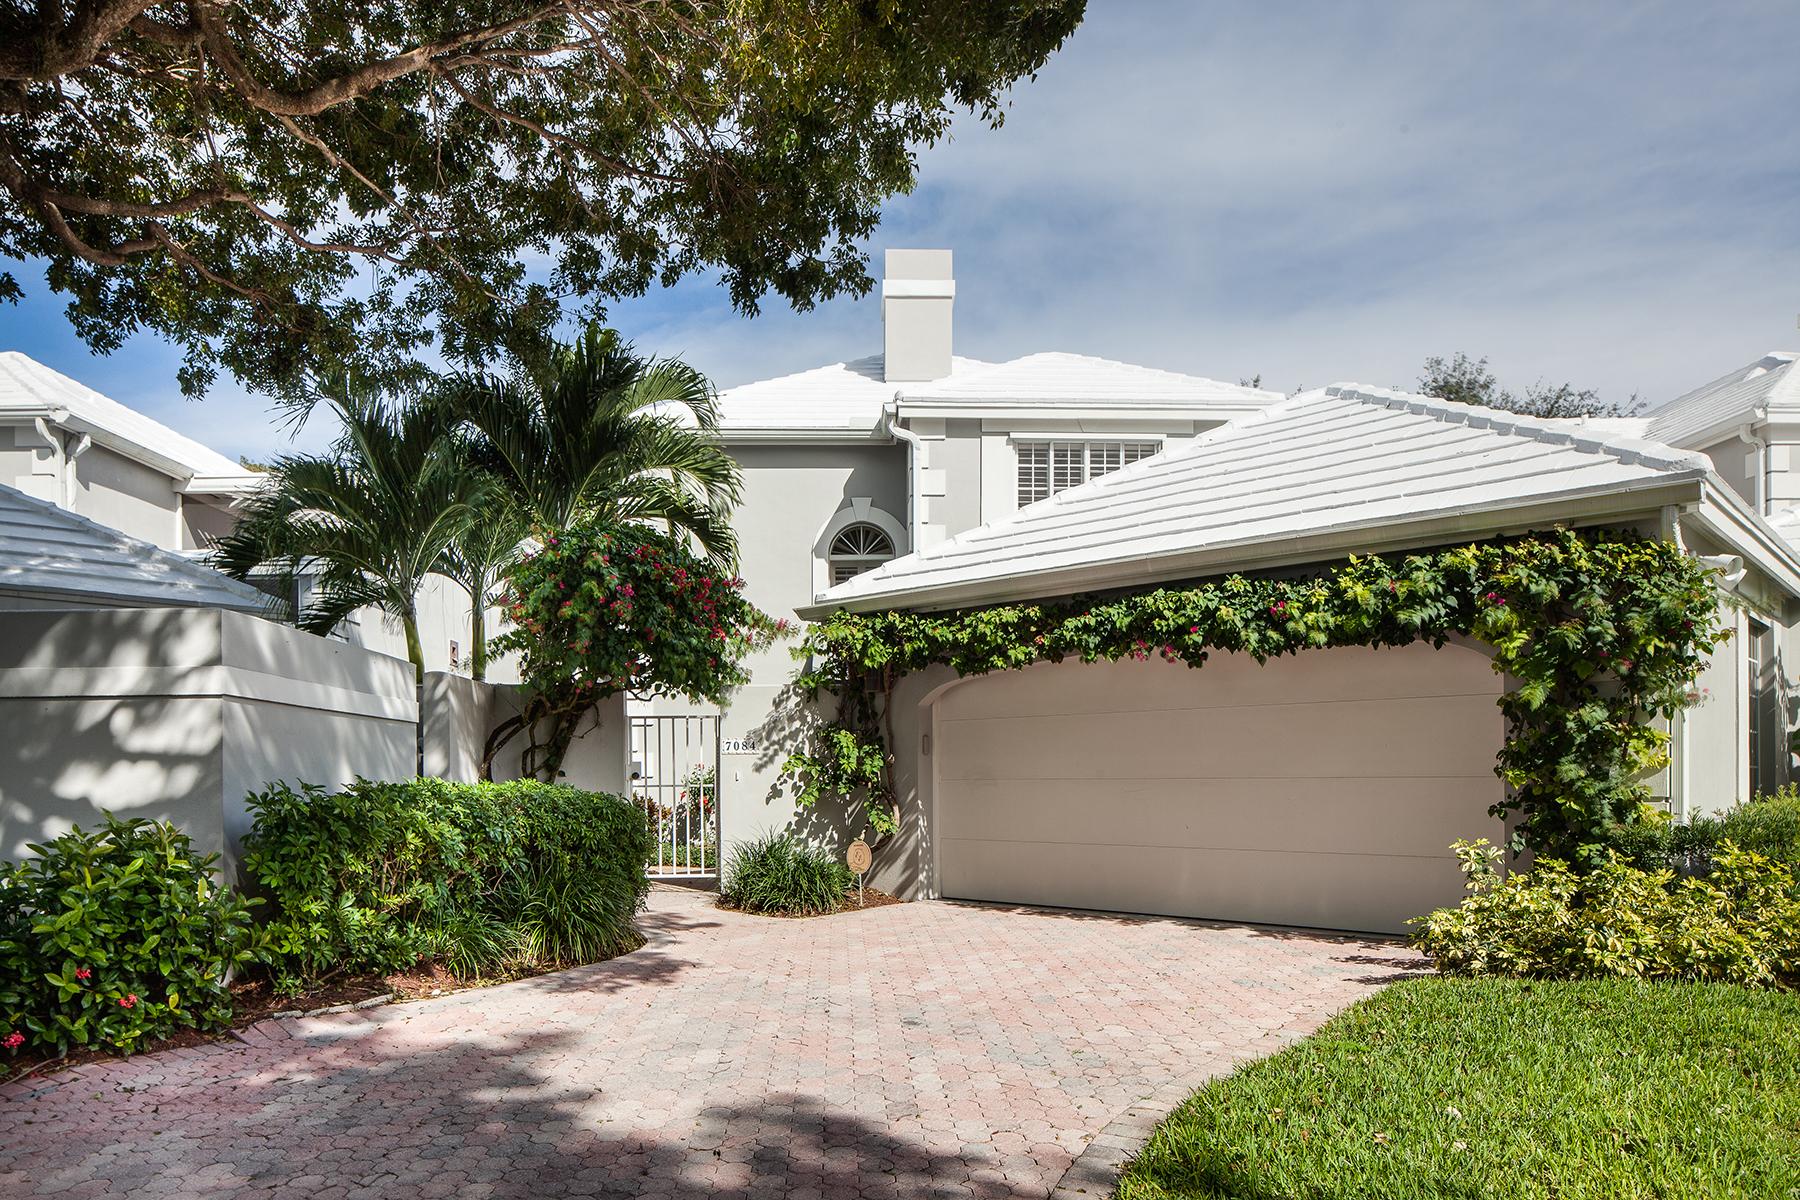 Property For Sale at 7084 Villa Lantana Way , 3.3, Naples, FL 34108